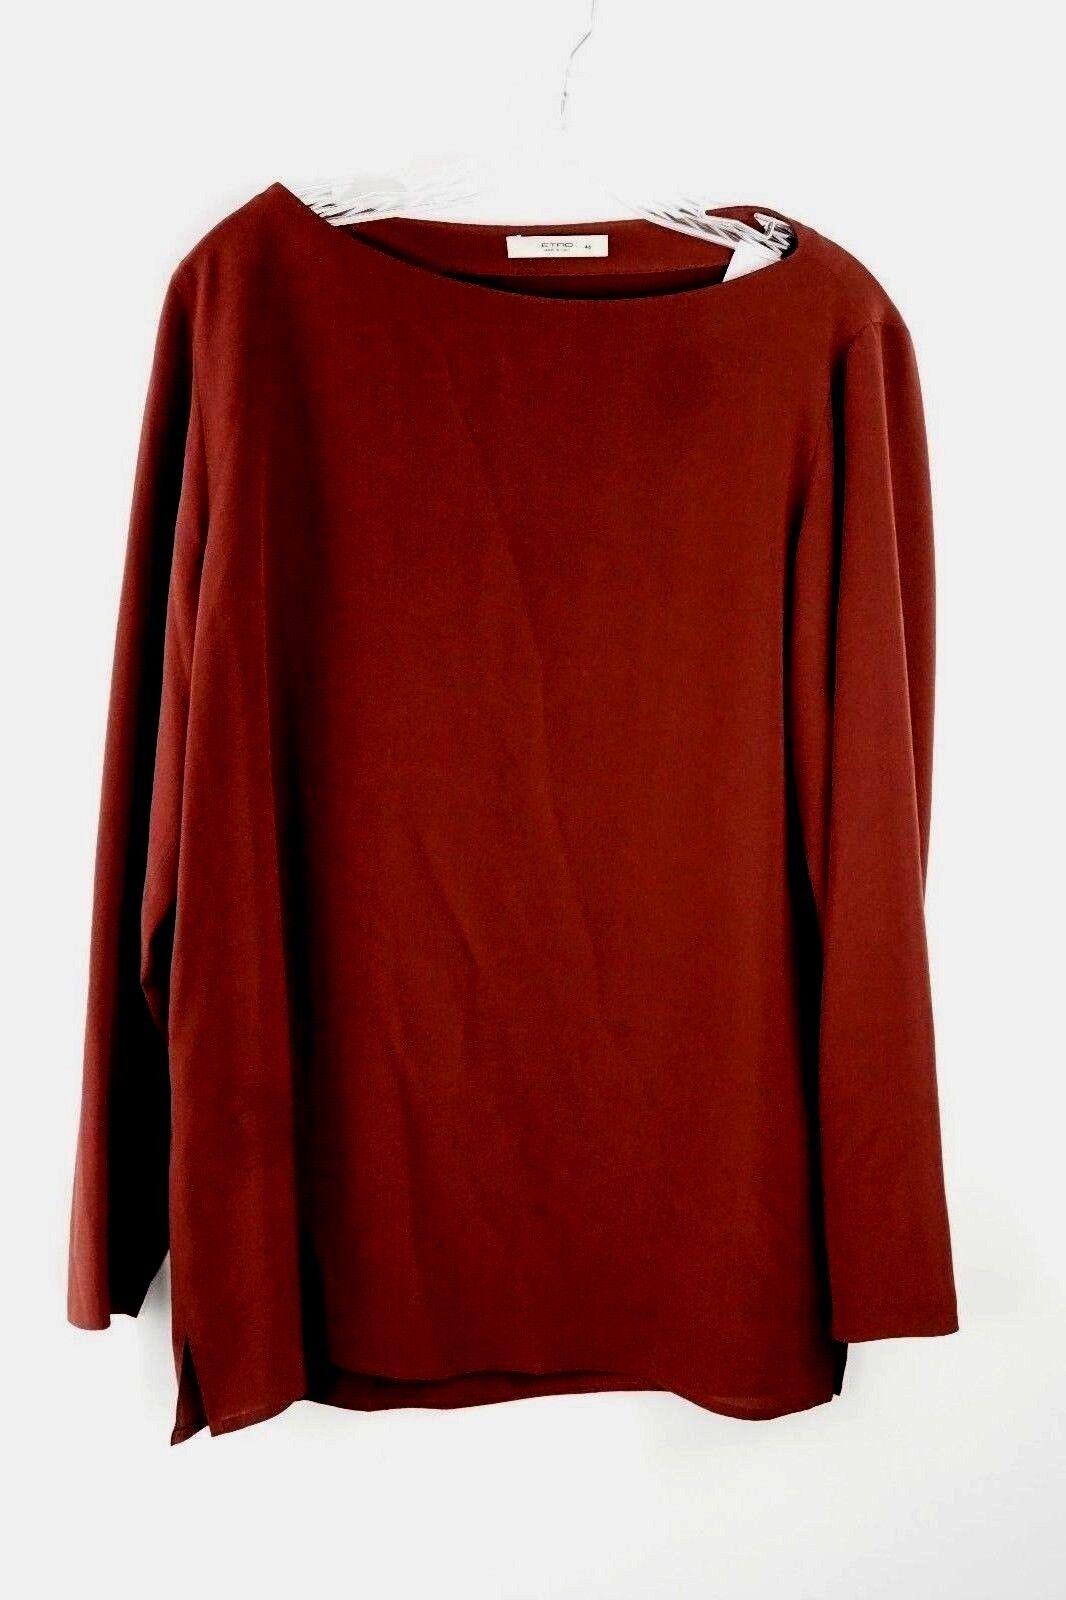 NWT  Womens Etro Burnt Brown 100% Silk Blouse Top Size Euro 46, US 12